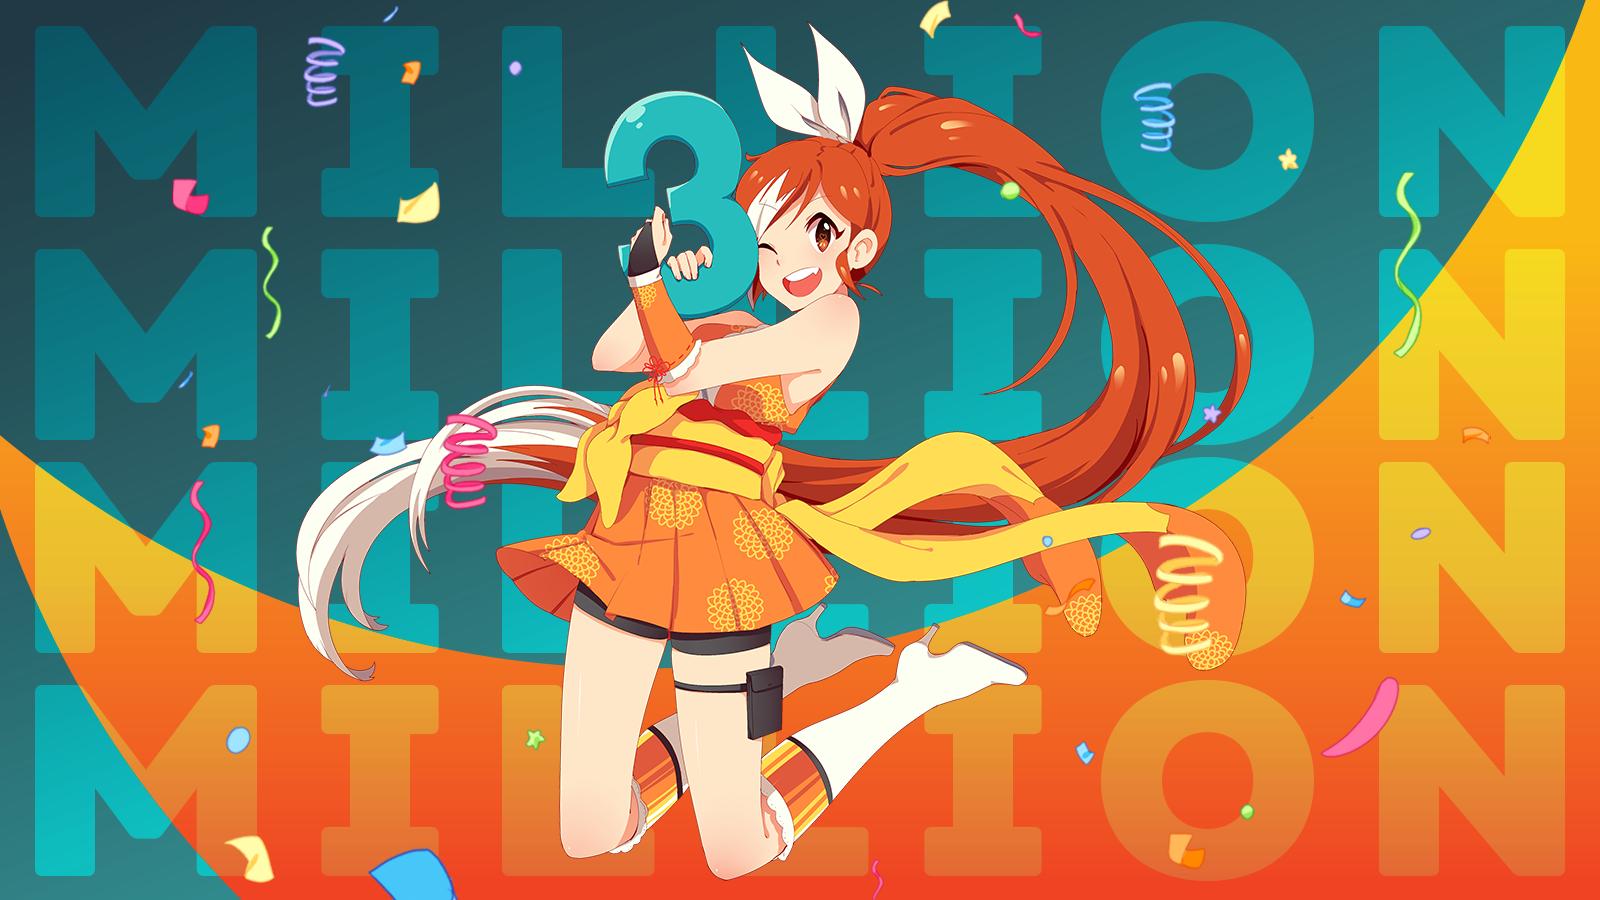 Crunchyroll - Crunchyroll Crosses Three Million Subscribers!